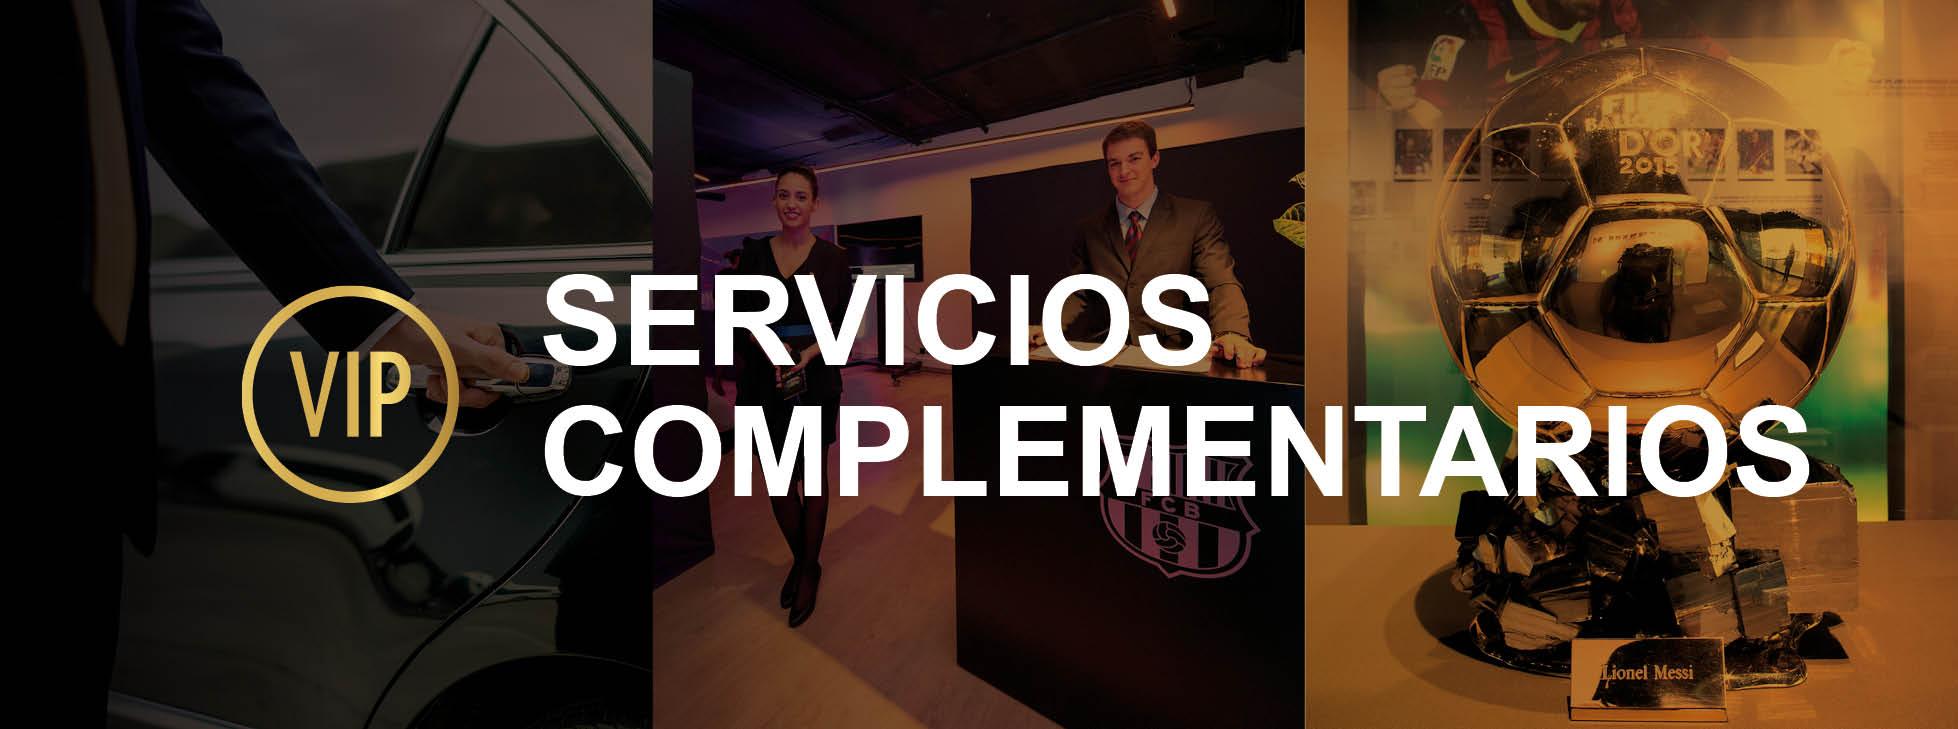 VIP SERVICIOS COMPLEMENTARIOS